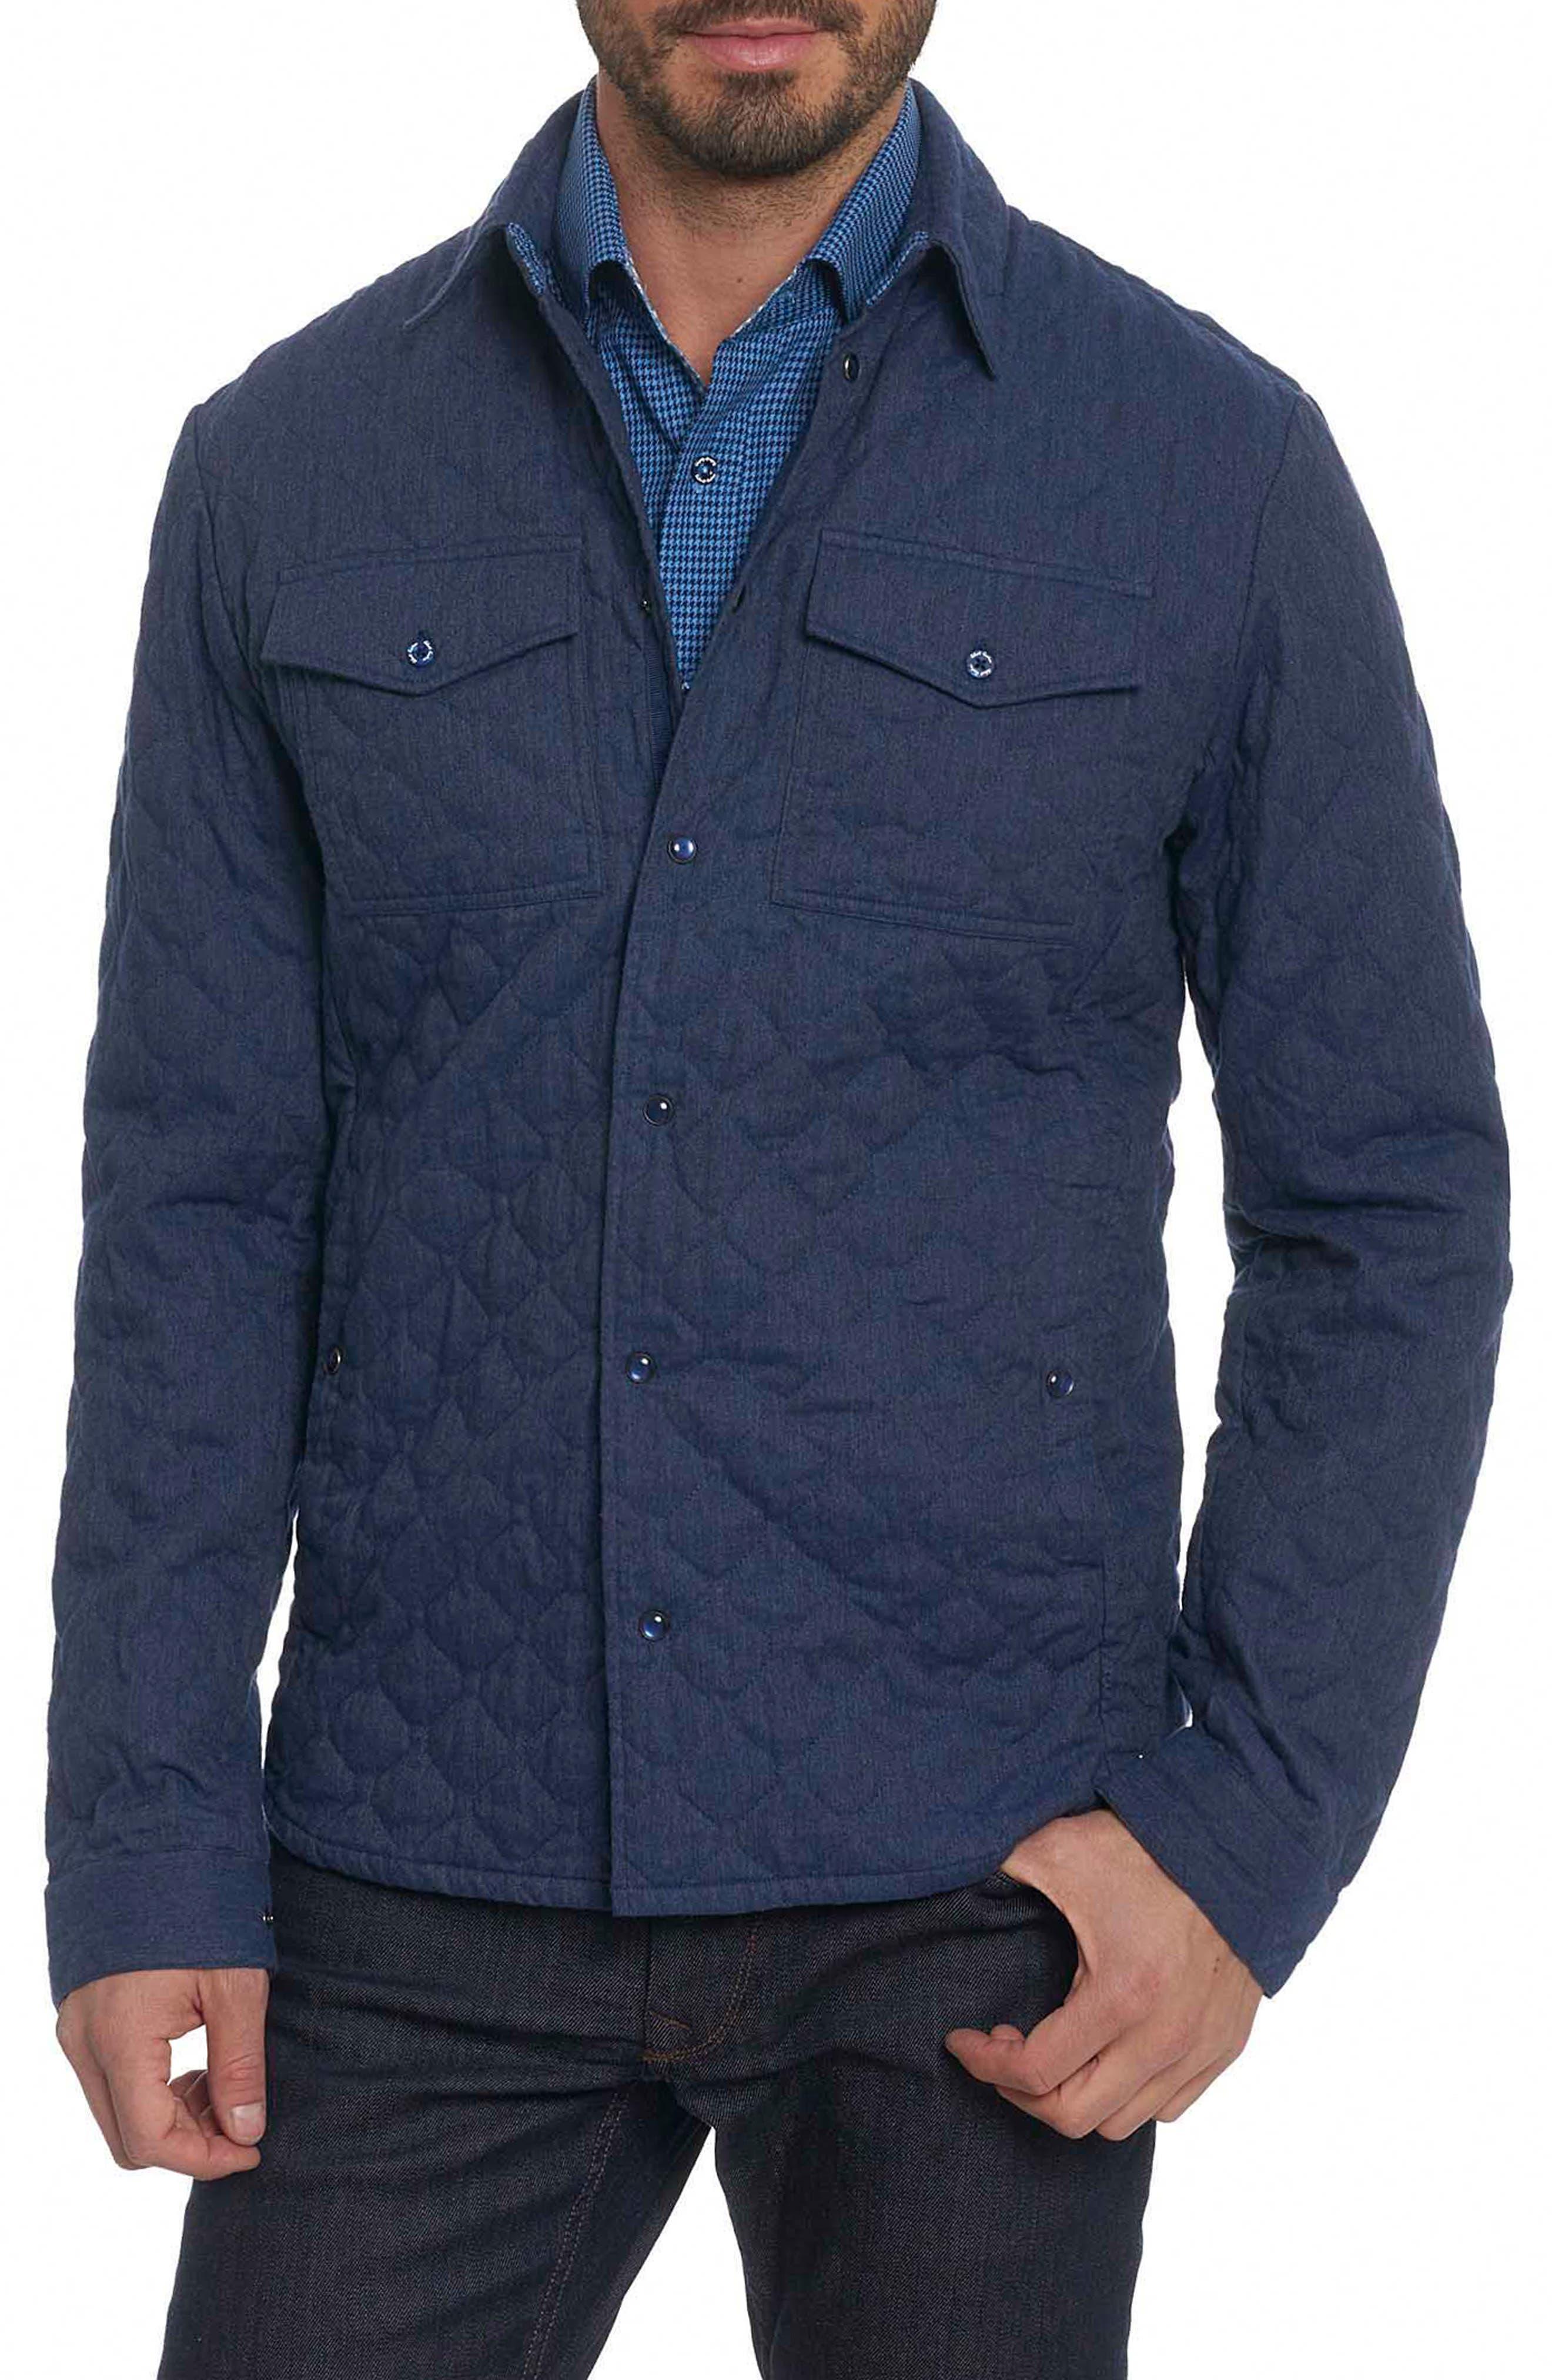 Main Image - Robert Graham Lance Quilted Shirt Jacket